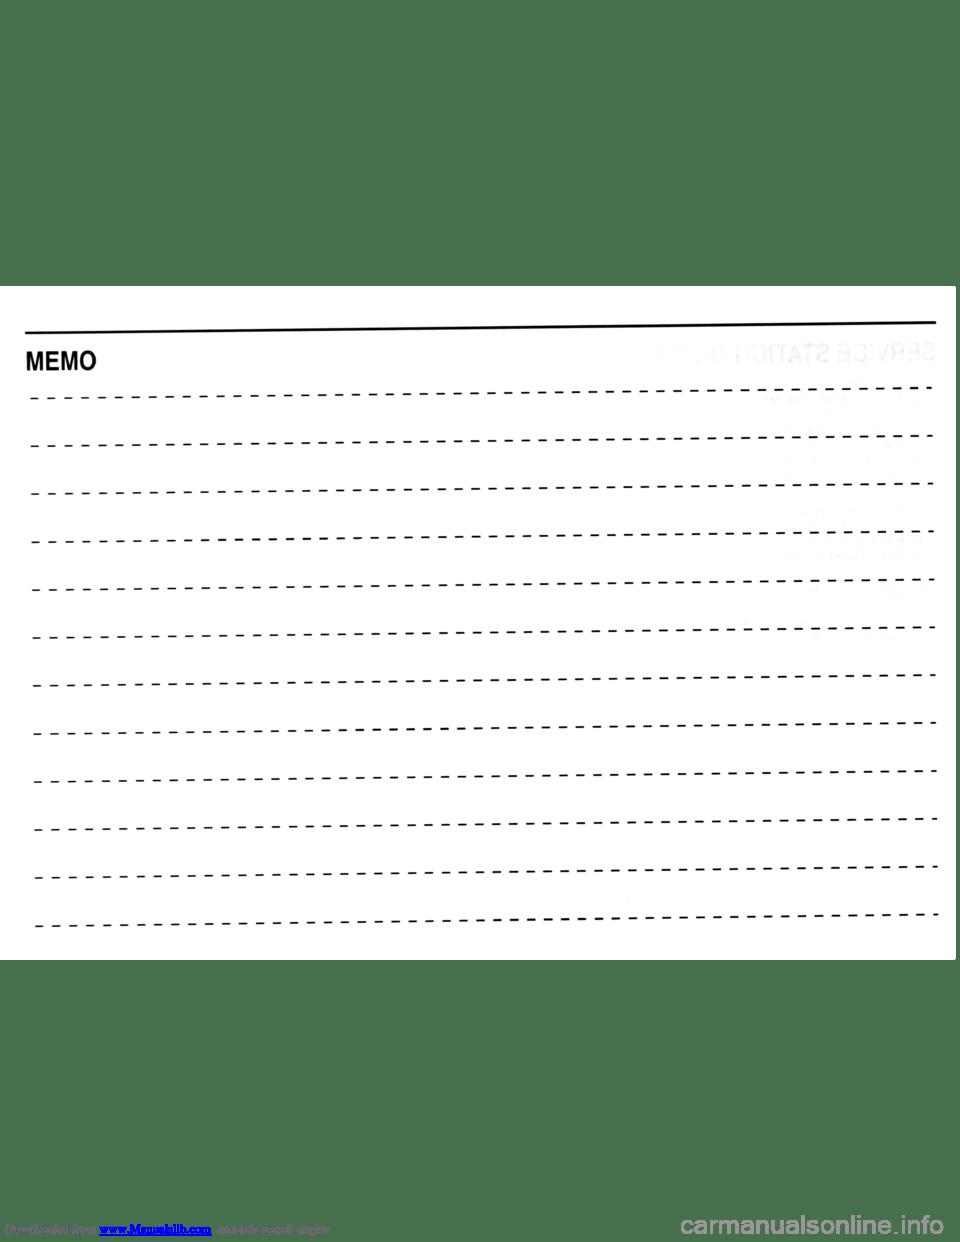 SUZUKI GRAND VITARA 2005 3.G Owners Manual